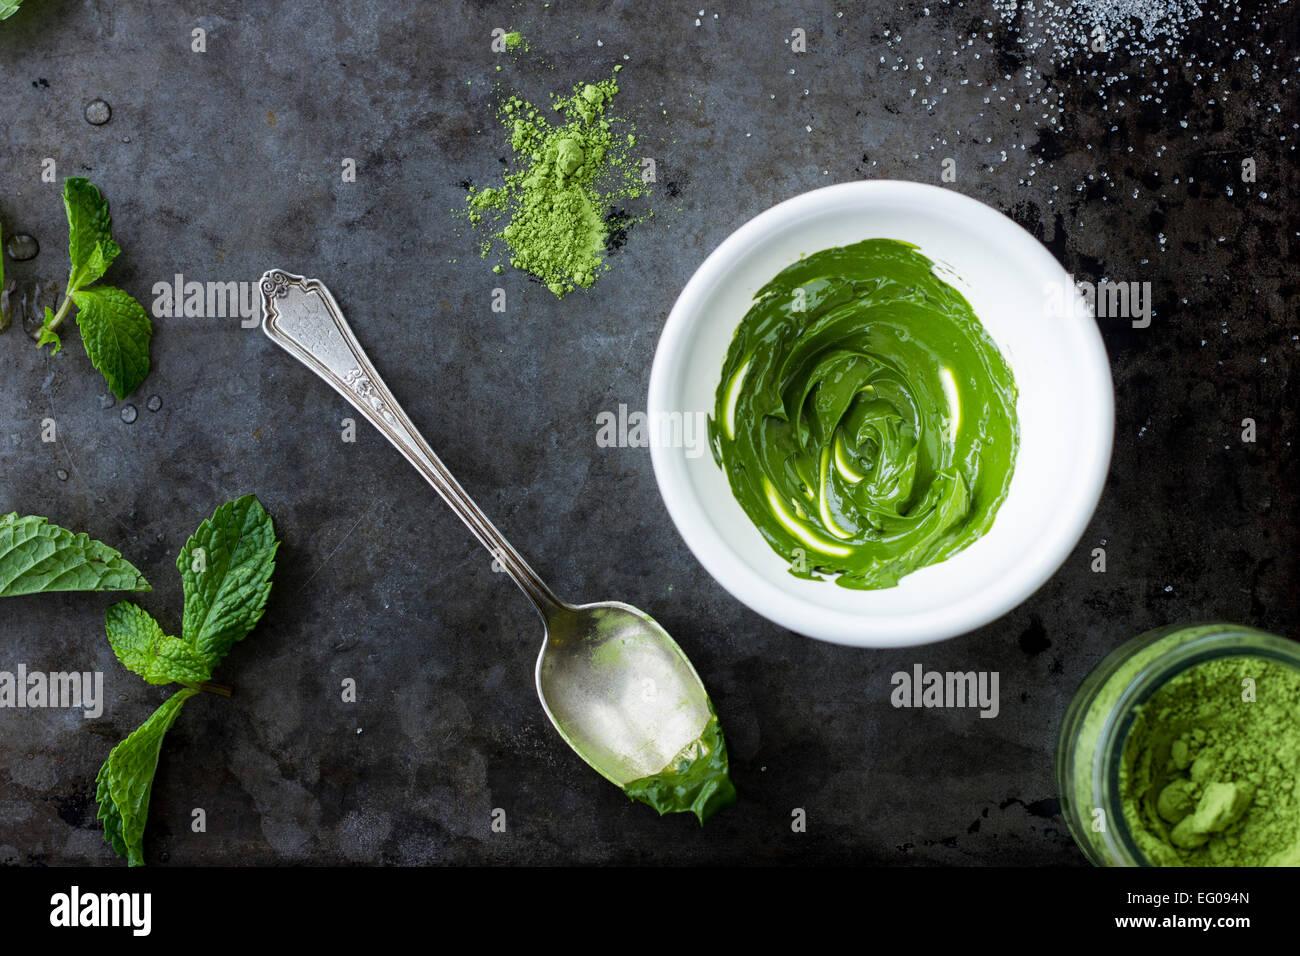 Matcha grren tea powder as a paste - Stock Image